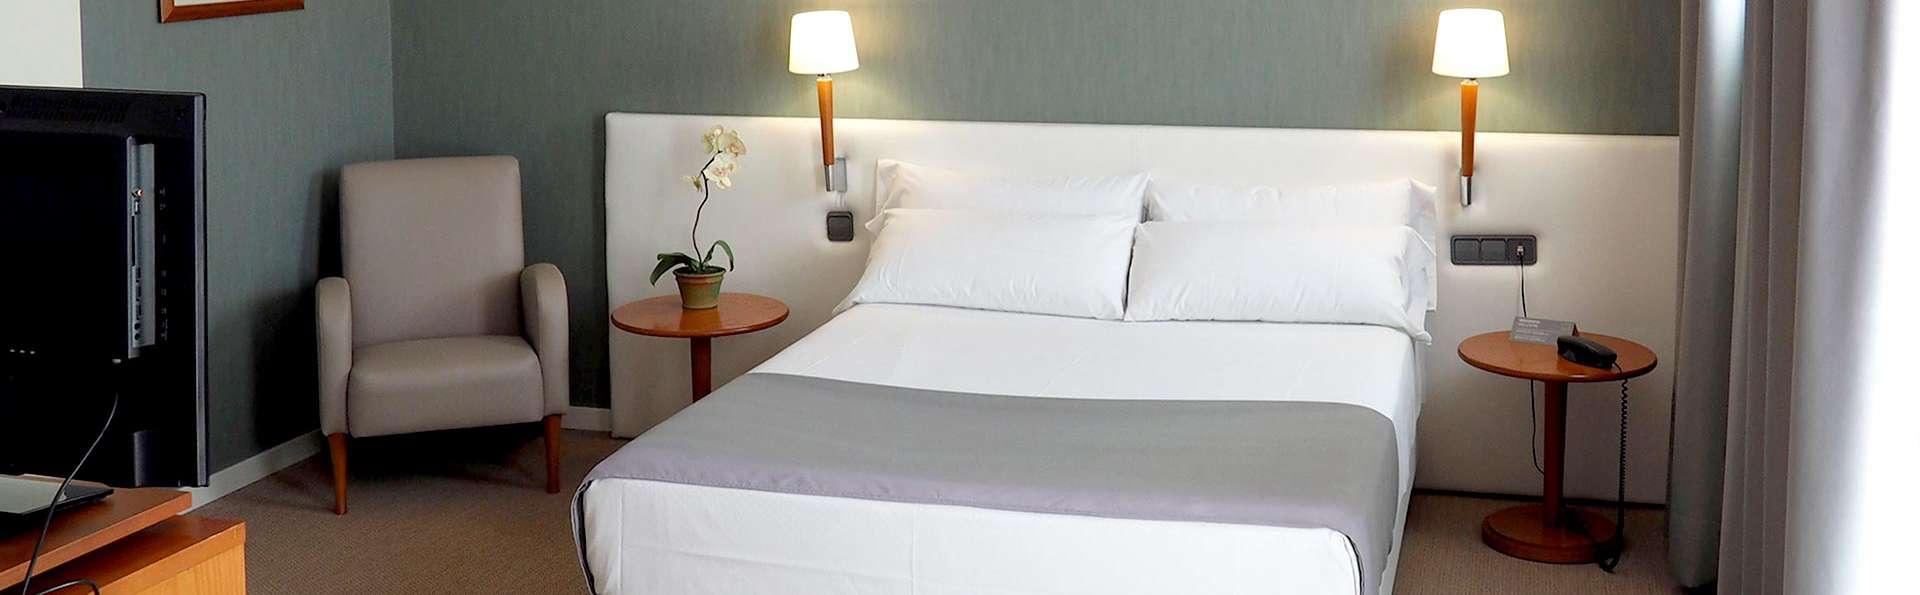 Hotel Alaquas - EDIT_NEW_ROOM3.jpg